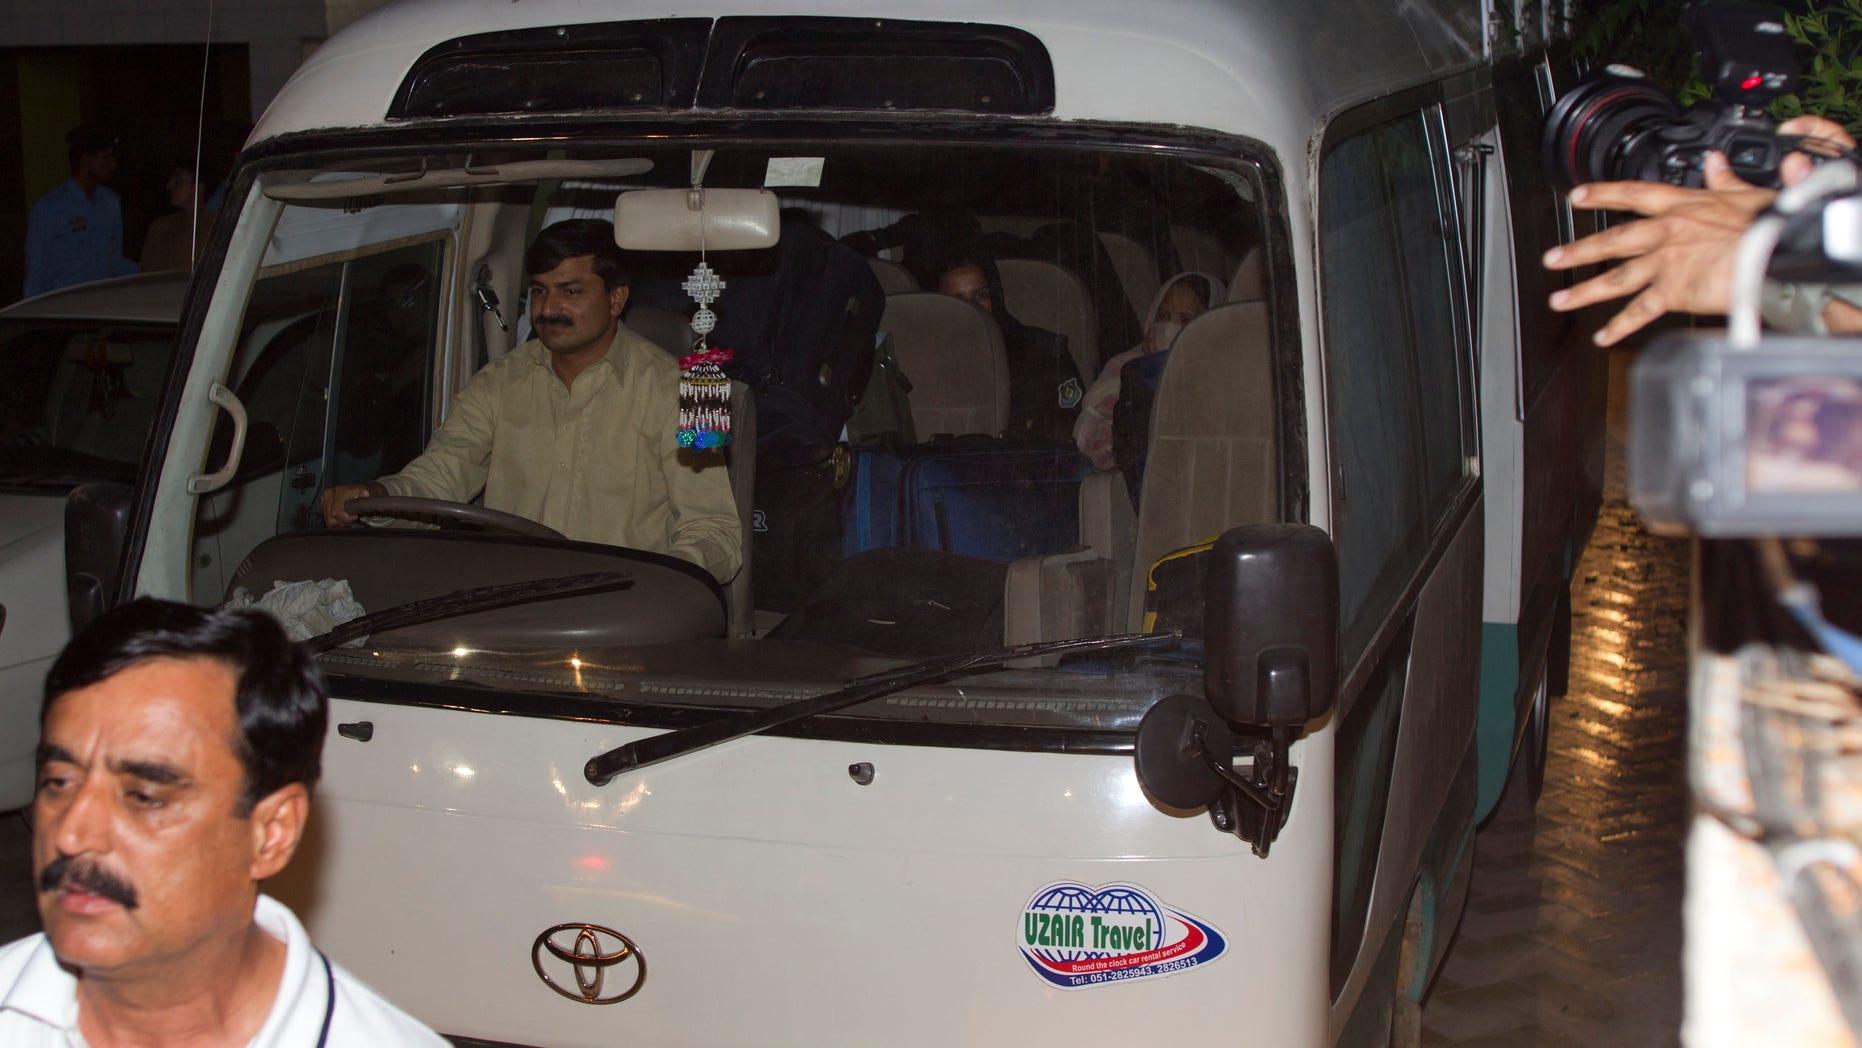 April 26, 2012: A minivan carries the family of Usama bin Laden, in Islamabad, Pakistan.